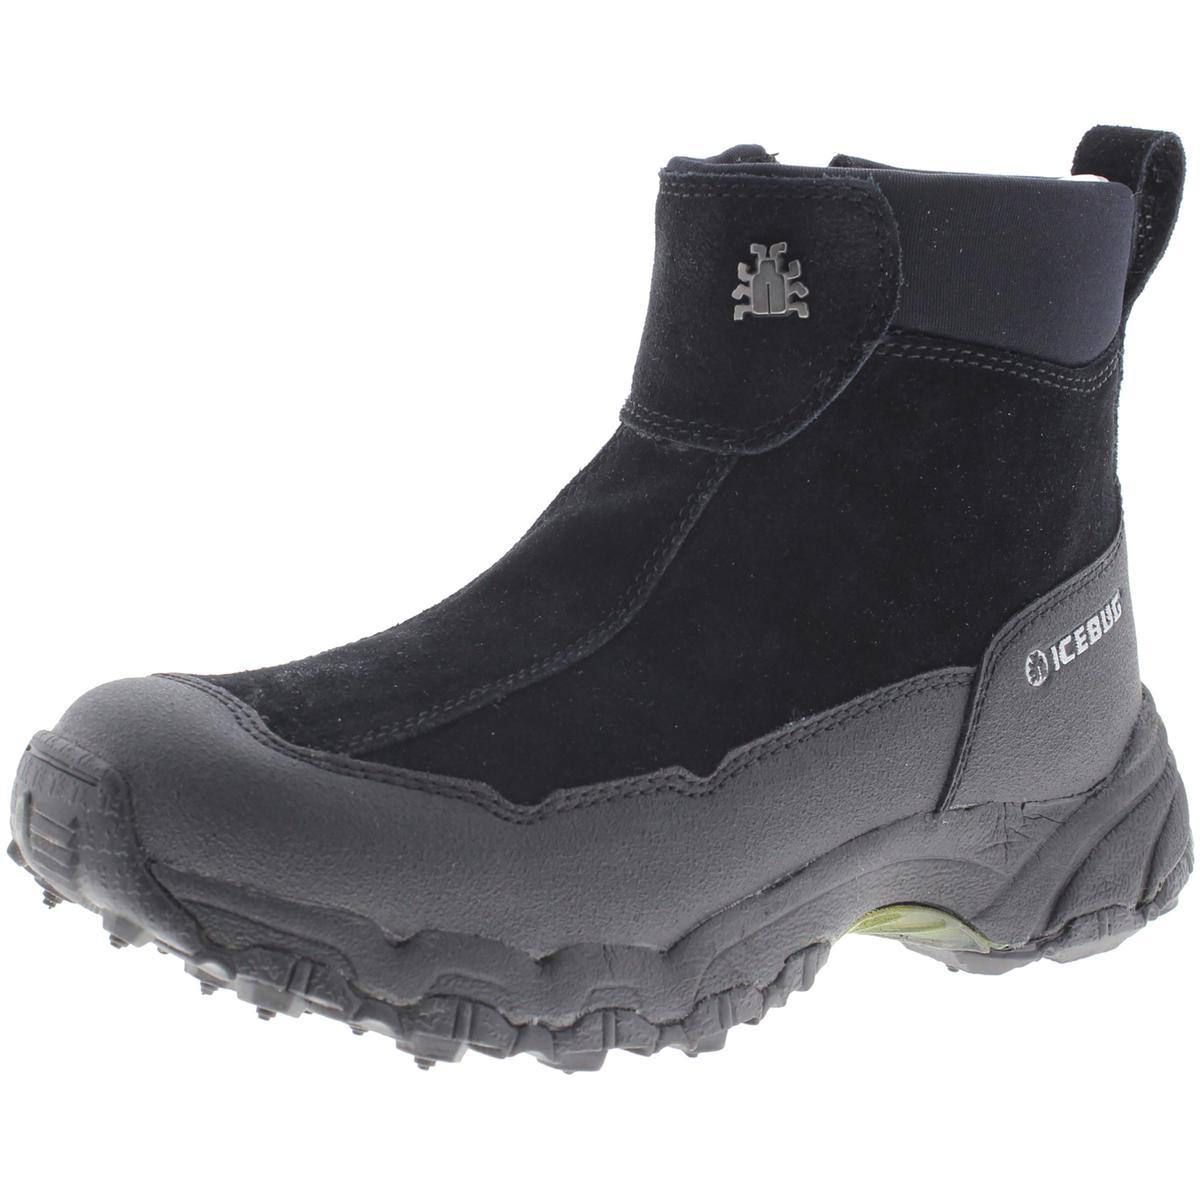 Icebug Womens Suede Waterproof Winter Boots